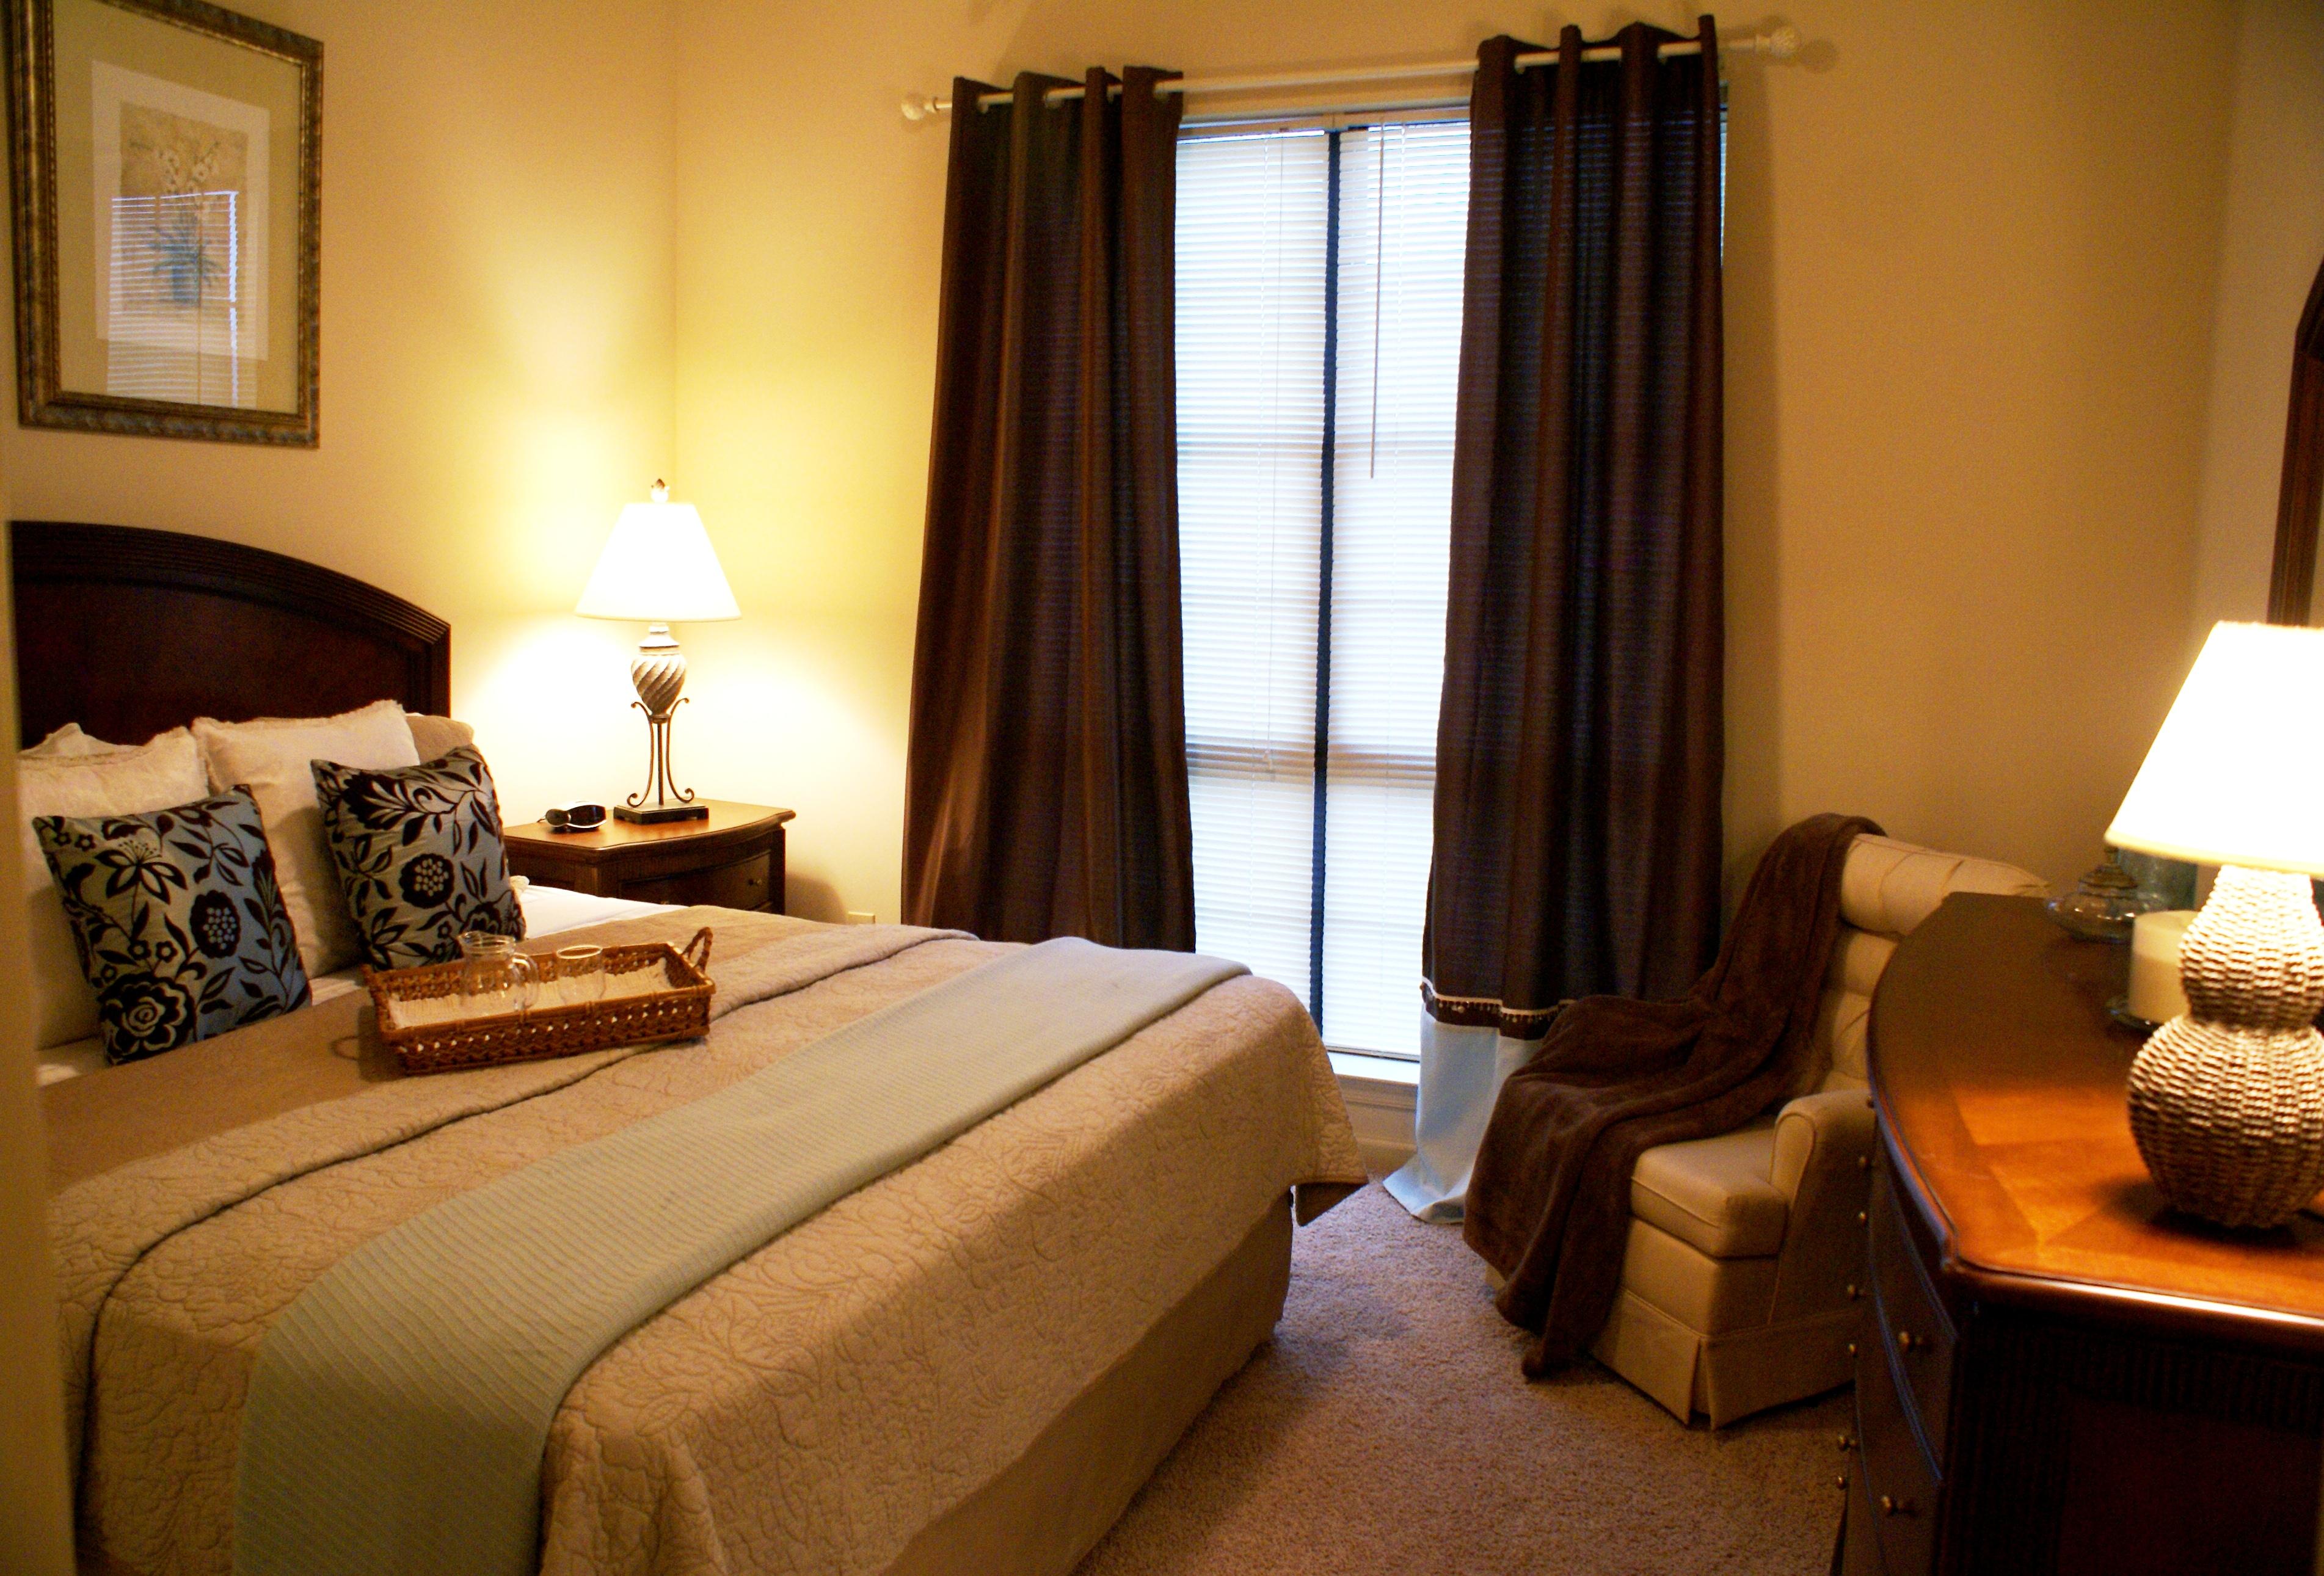 Quality Bed & Bath Linens